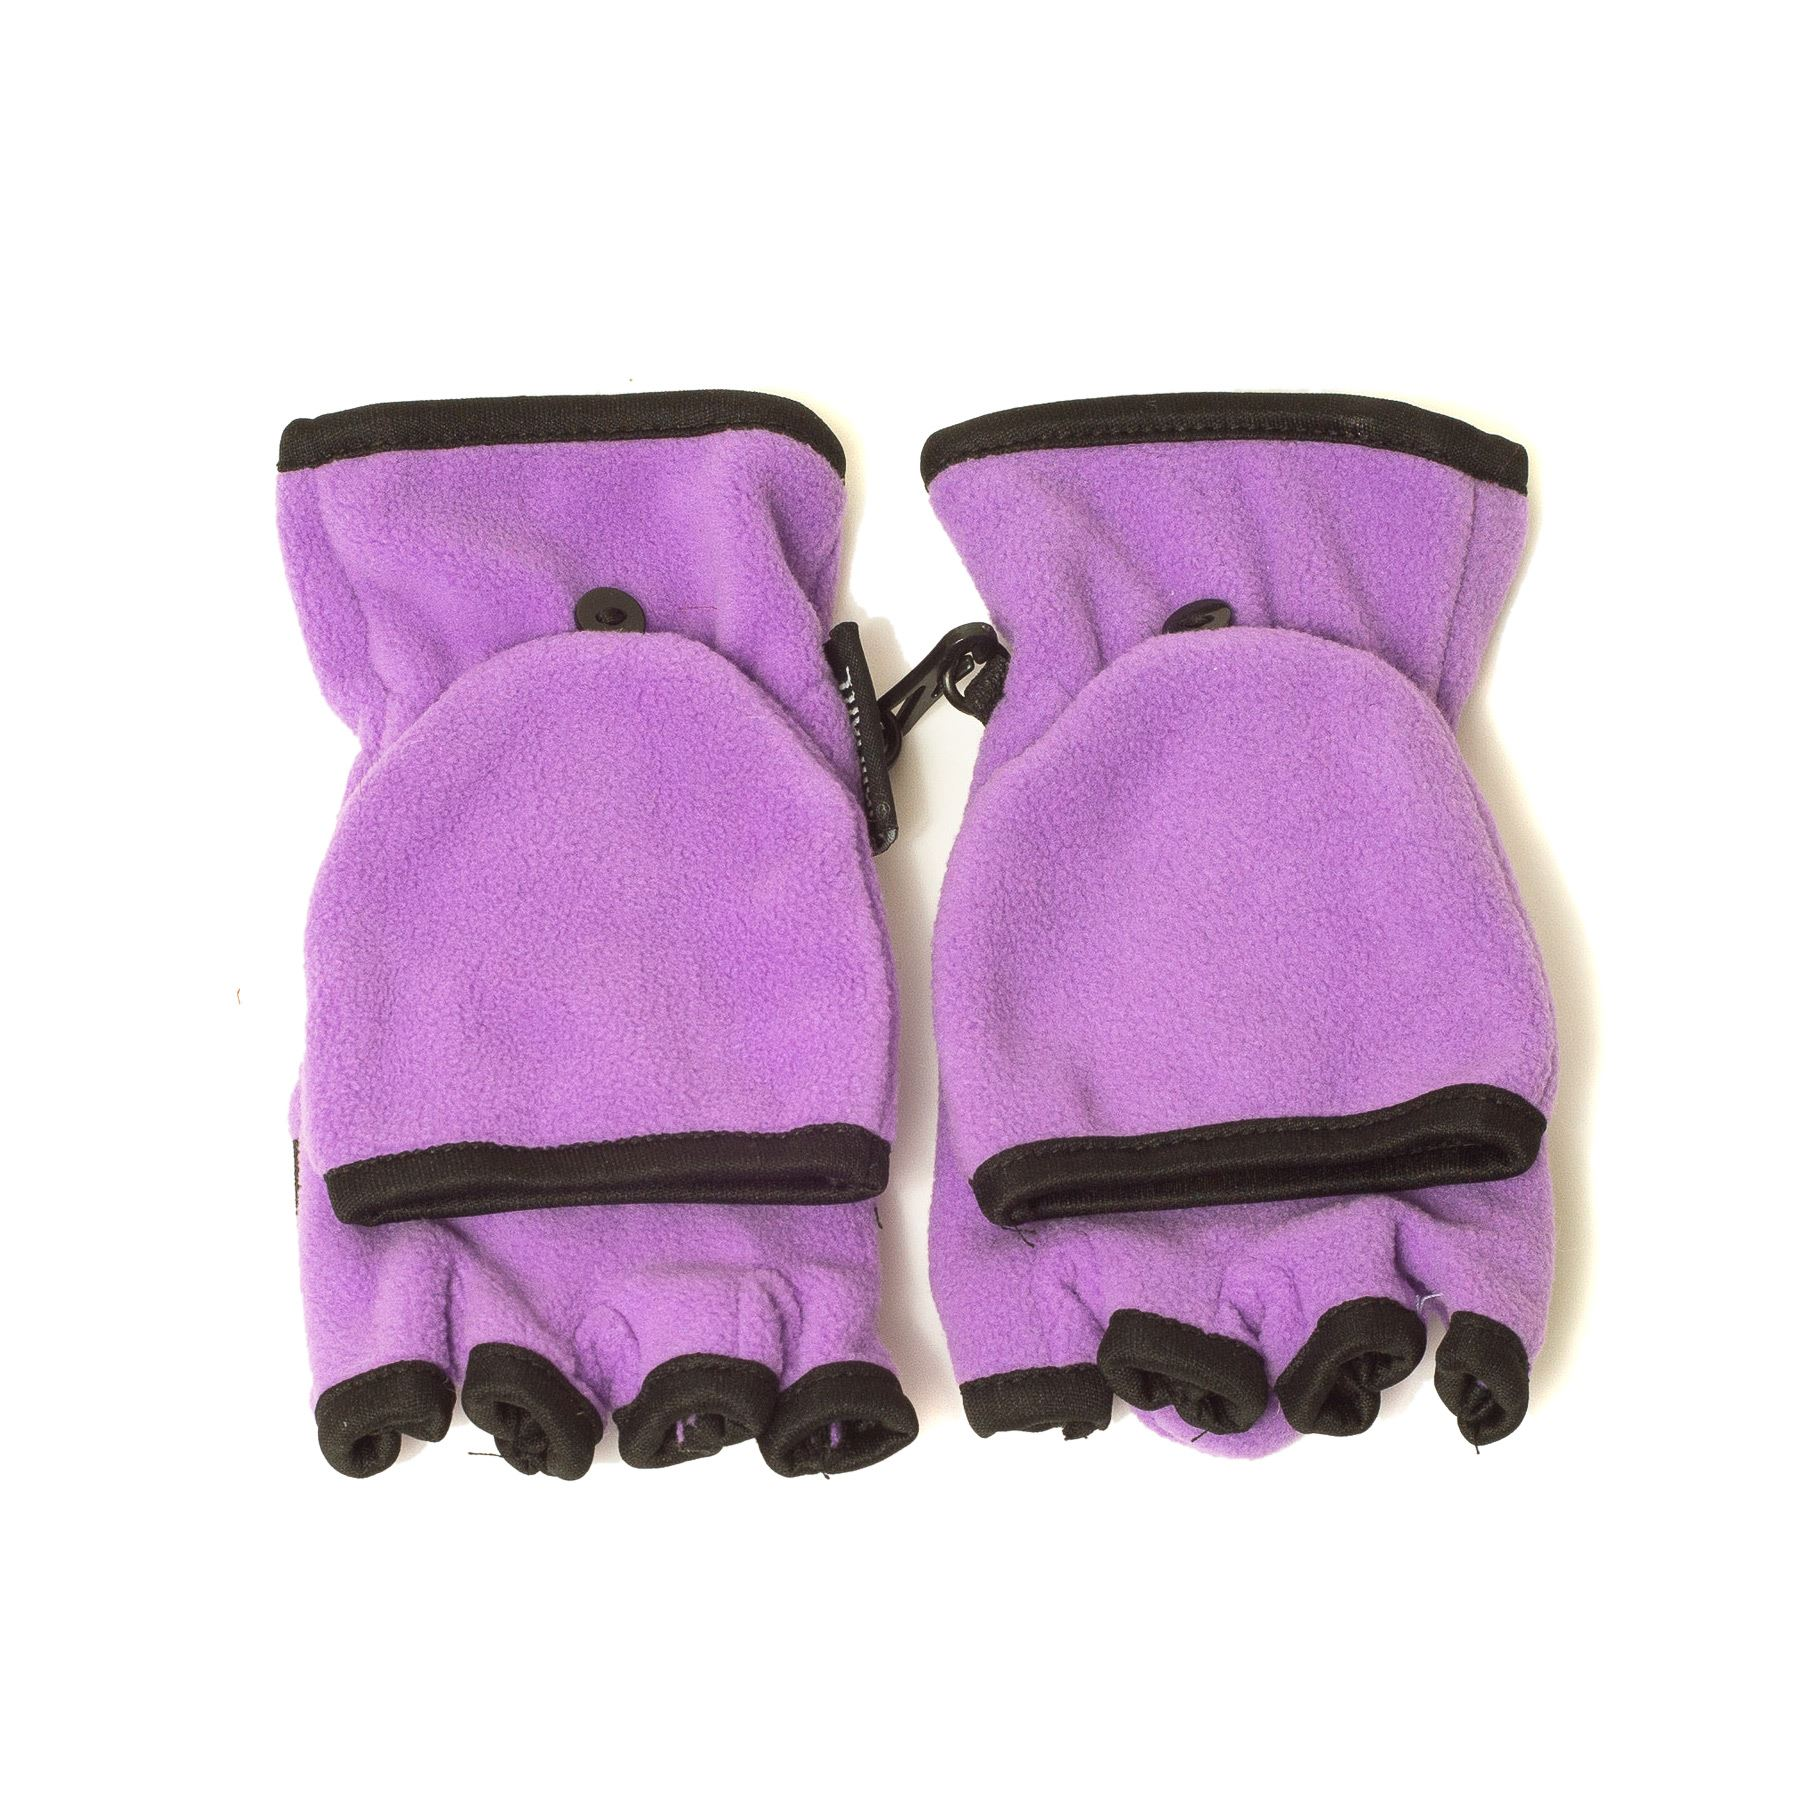 Fingerless driving gloves ebay -  Picture 3 Of 3